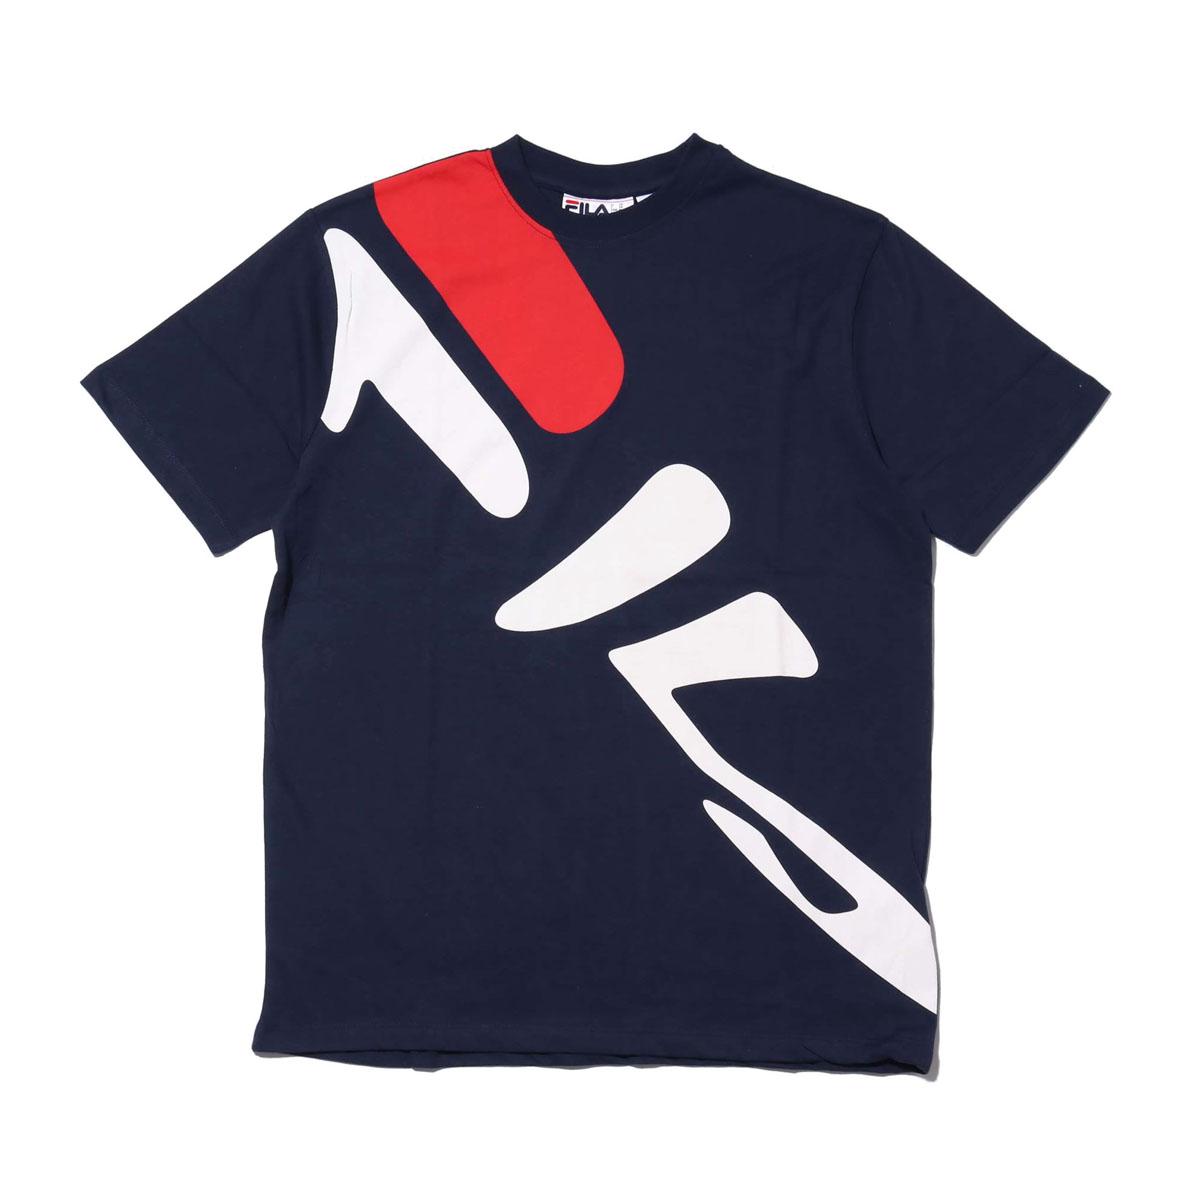 FILA MARCEL TEE(NAVY)(フィラ マルセル ティ)【メンズ】【Tシャツ】【18SS-I】